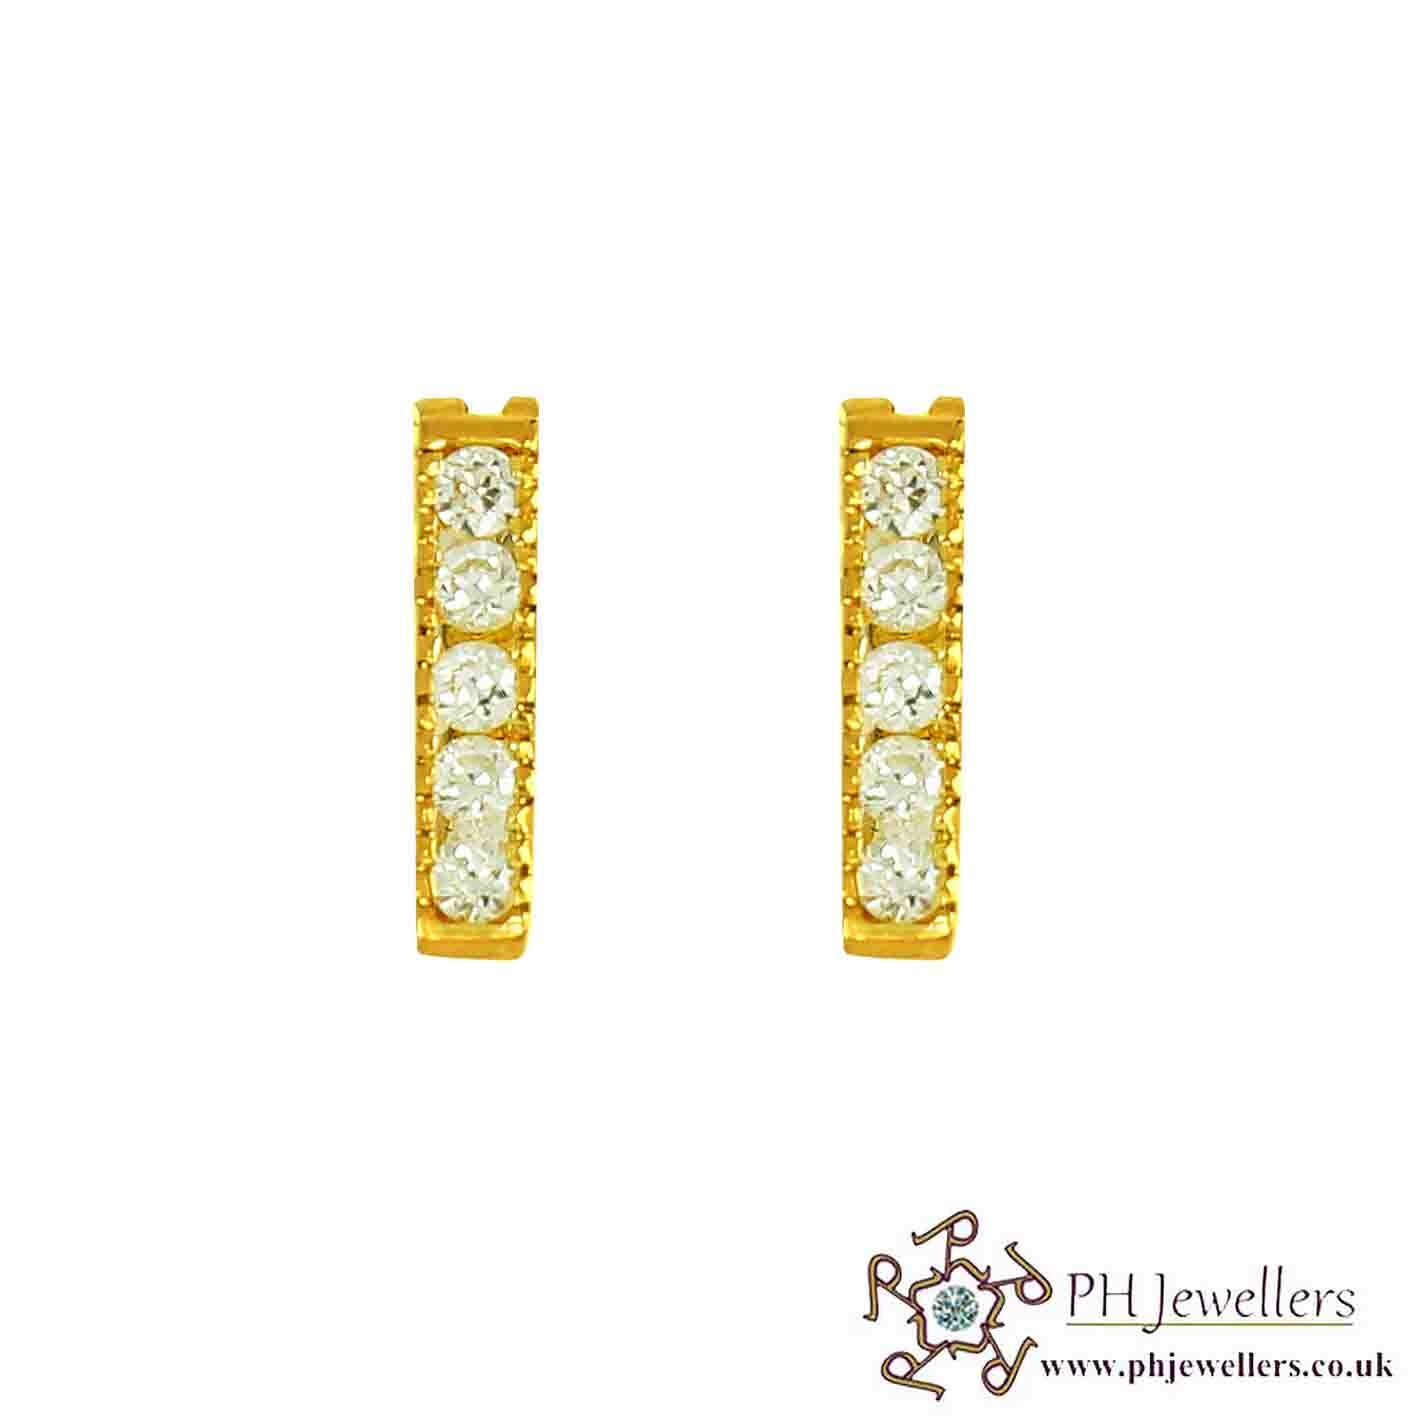 22ct 916 Hallmark Yellow Gold Clip-On  Earring CZ CE28